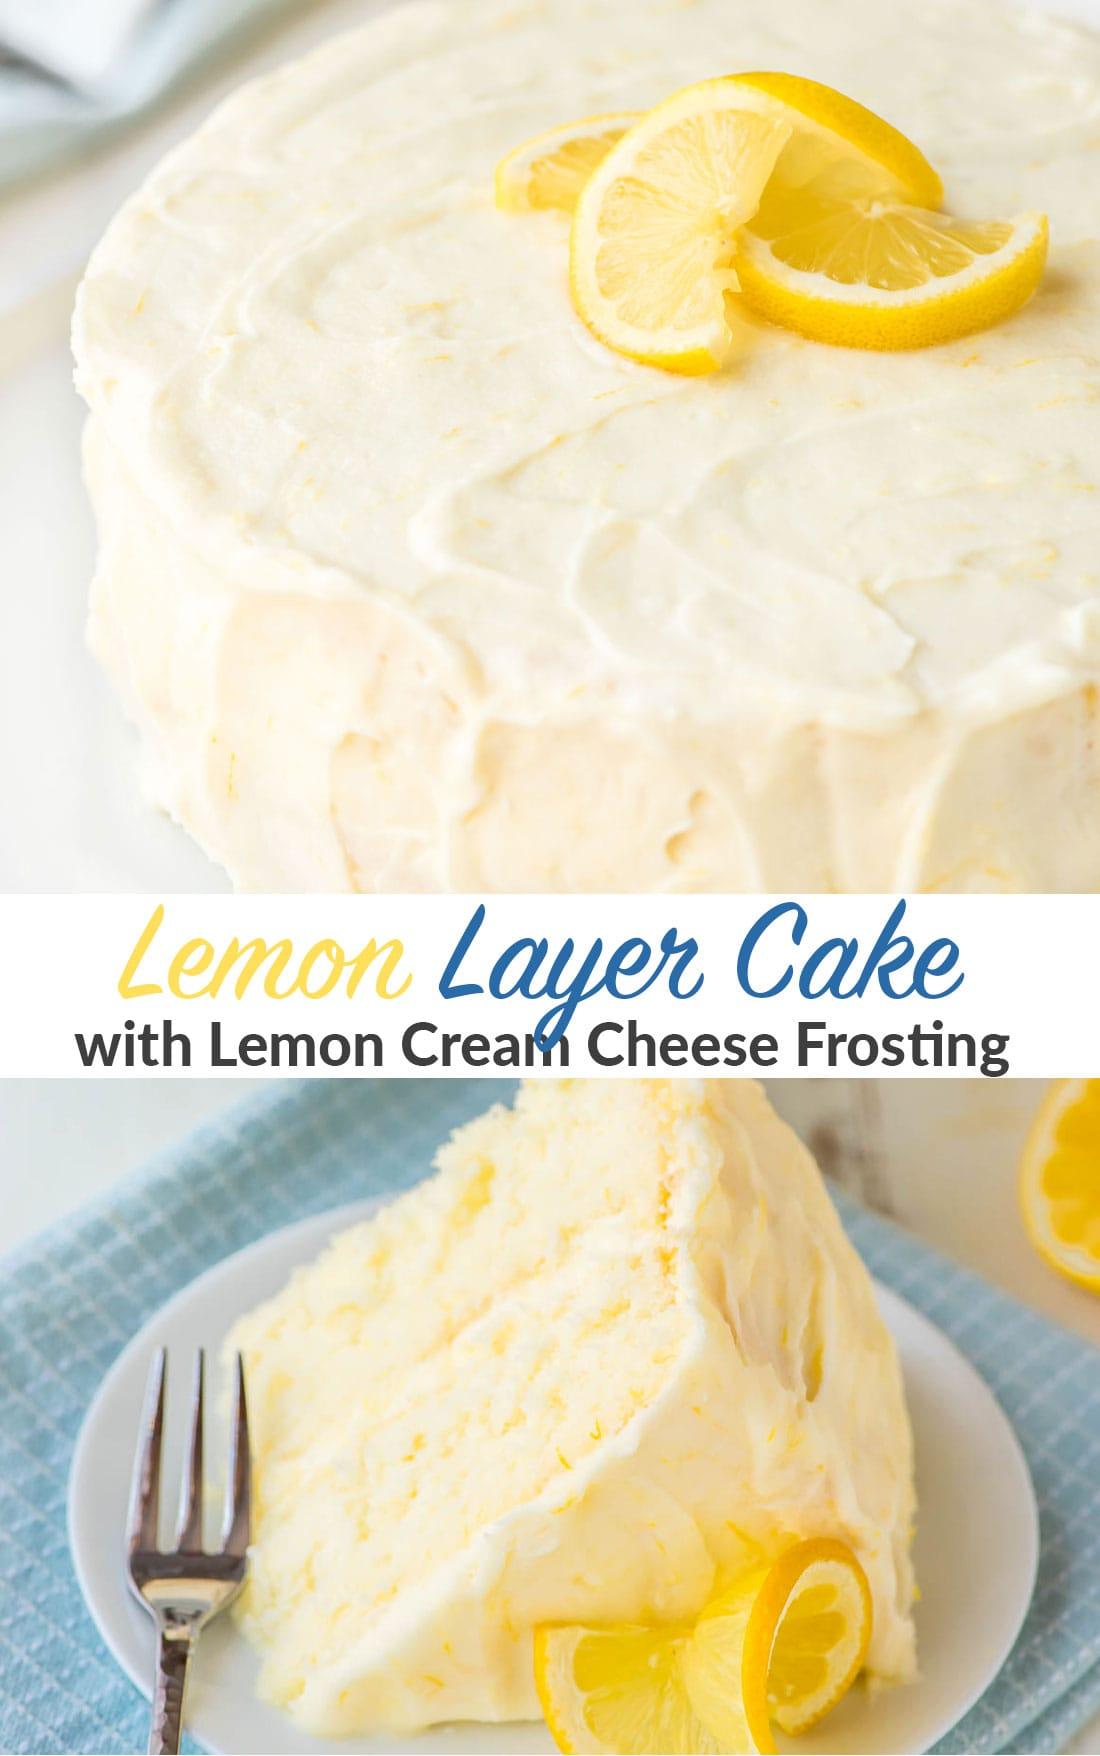 Lemon Layer Cake with Lemon Cream Cheese Frosting Recipe